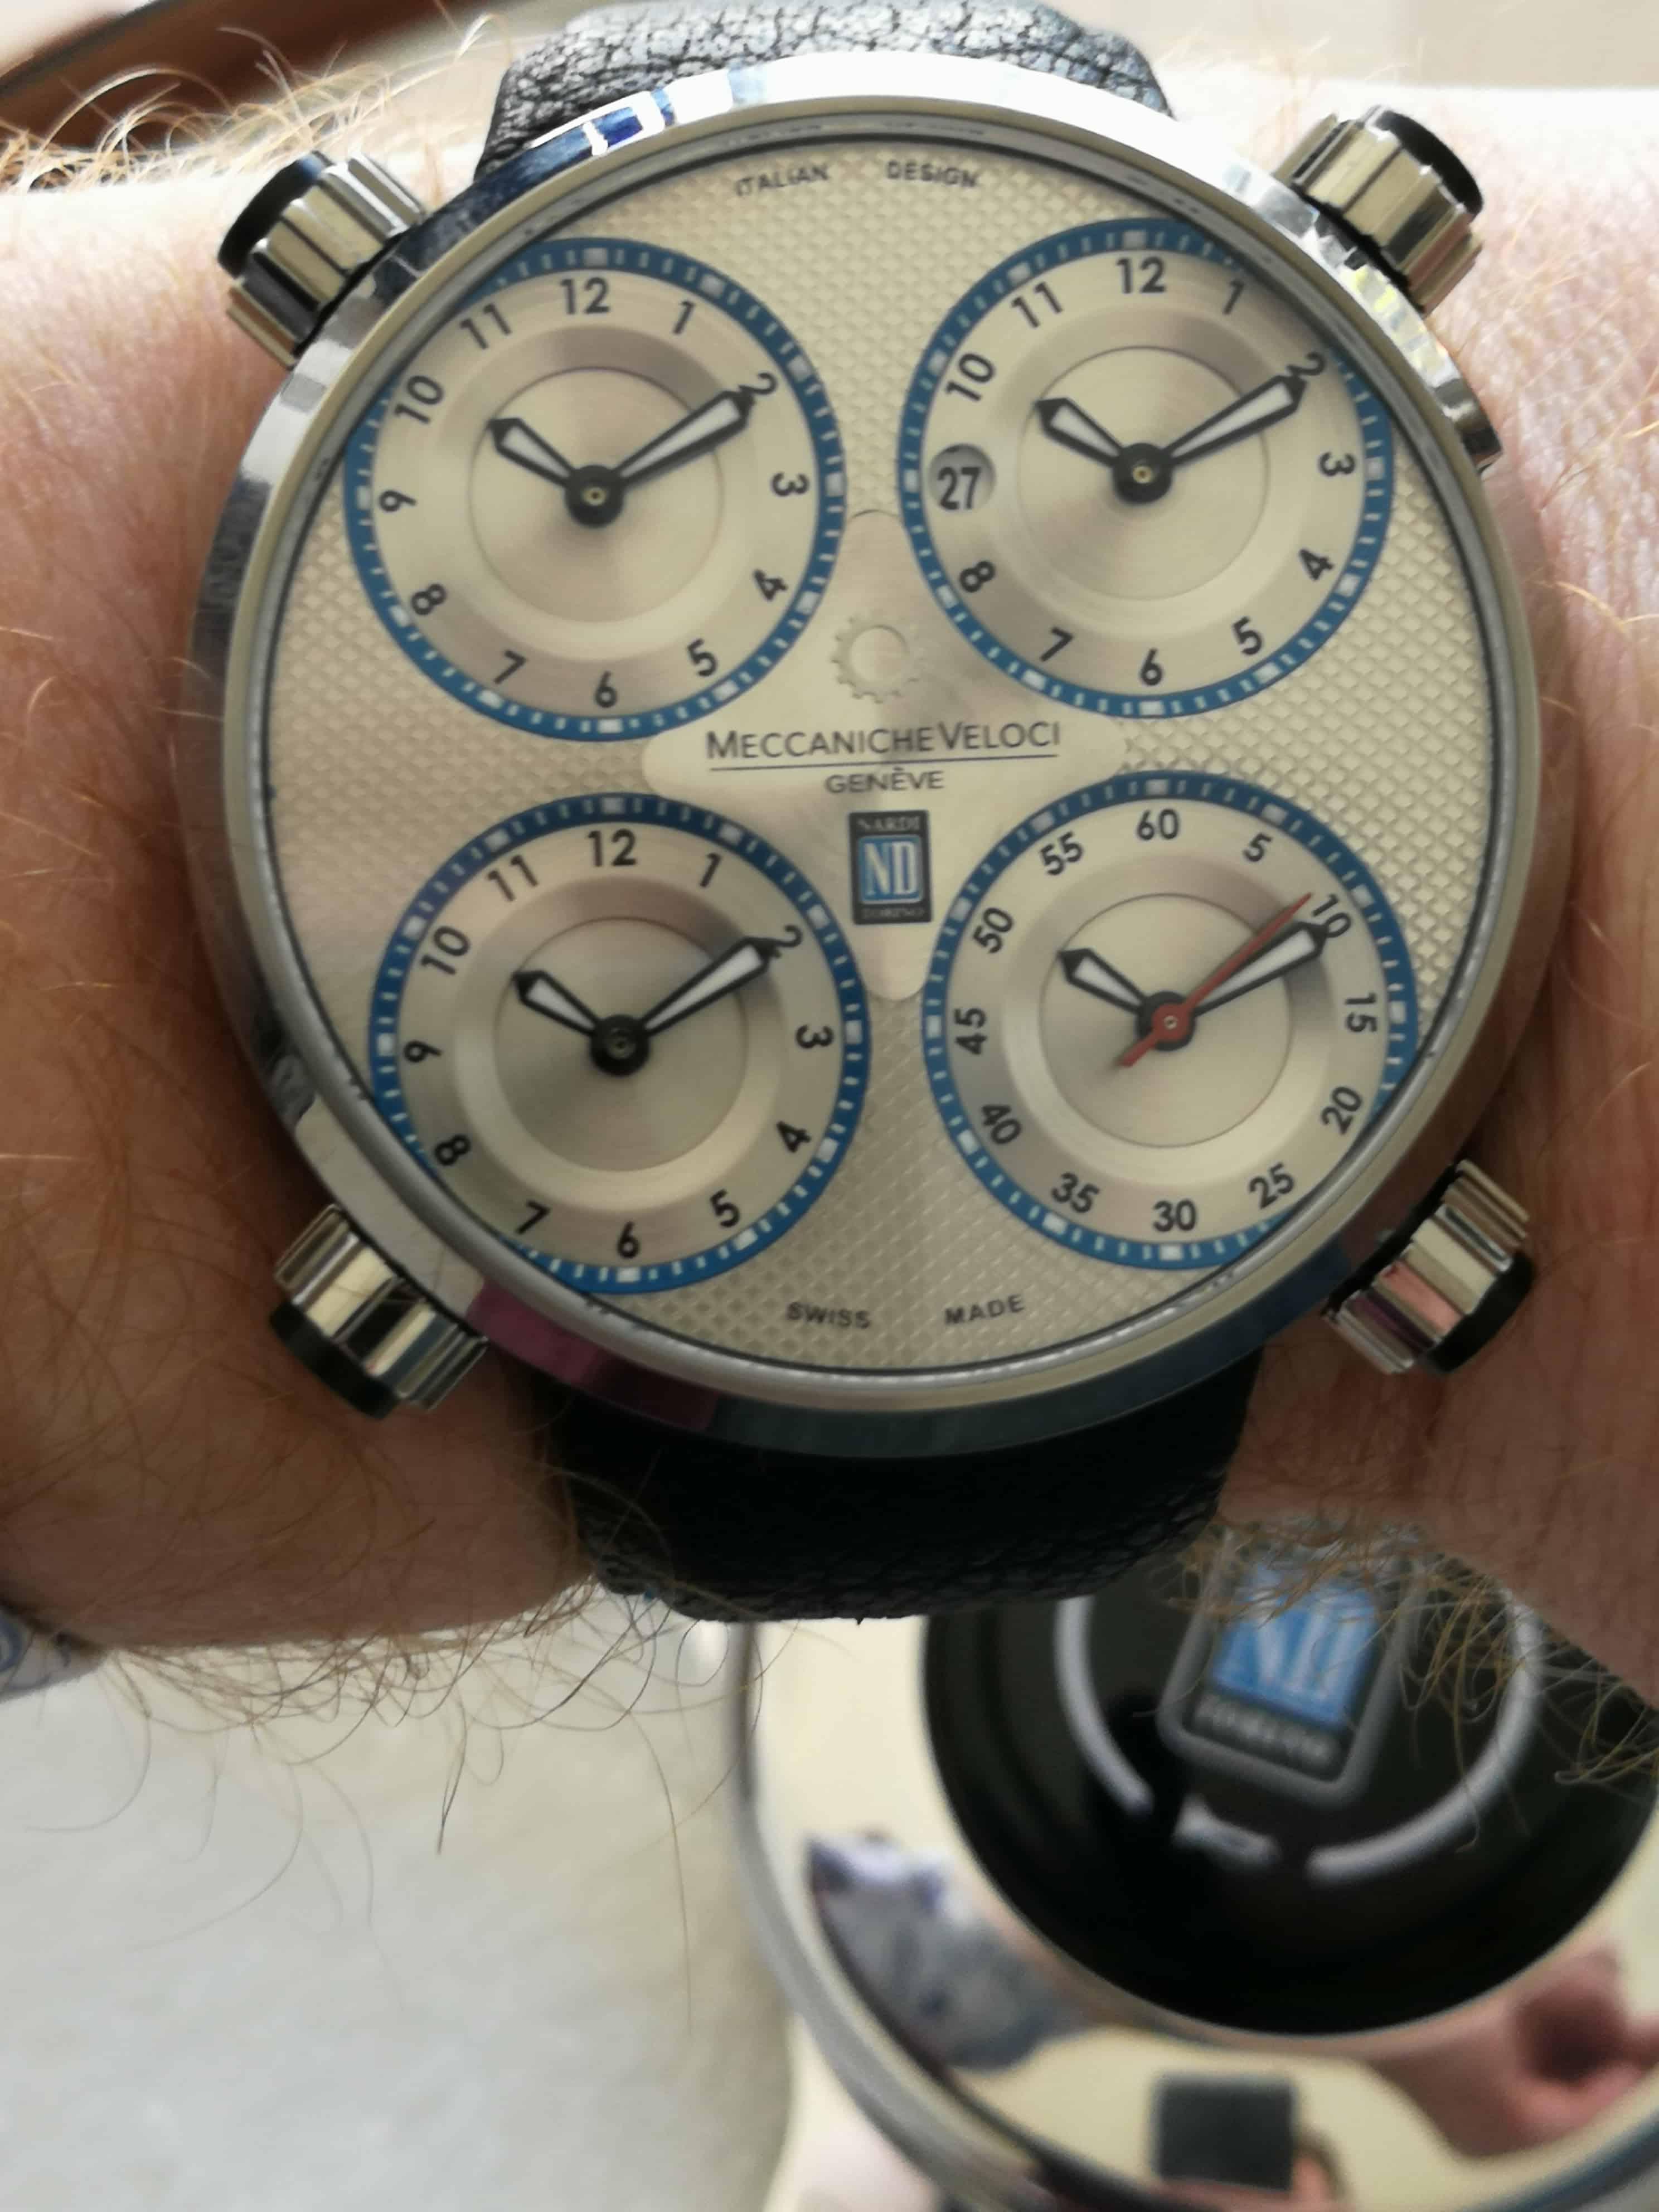 Meccaniche Veloci Quattro Valvoli Nardi on the wrist